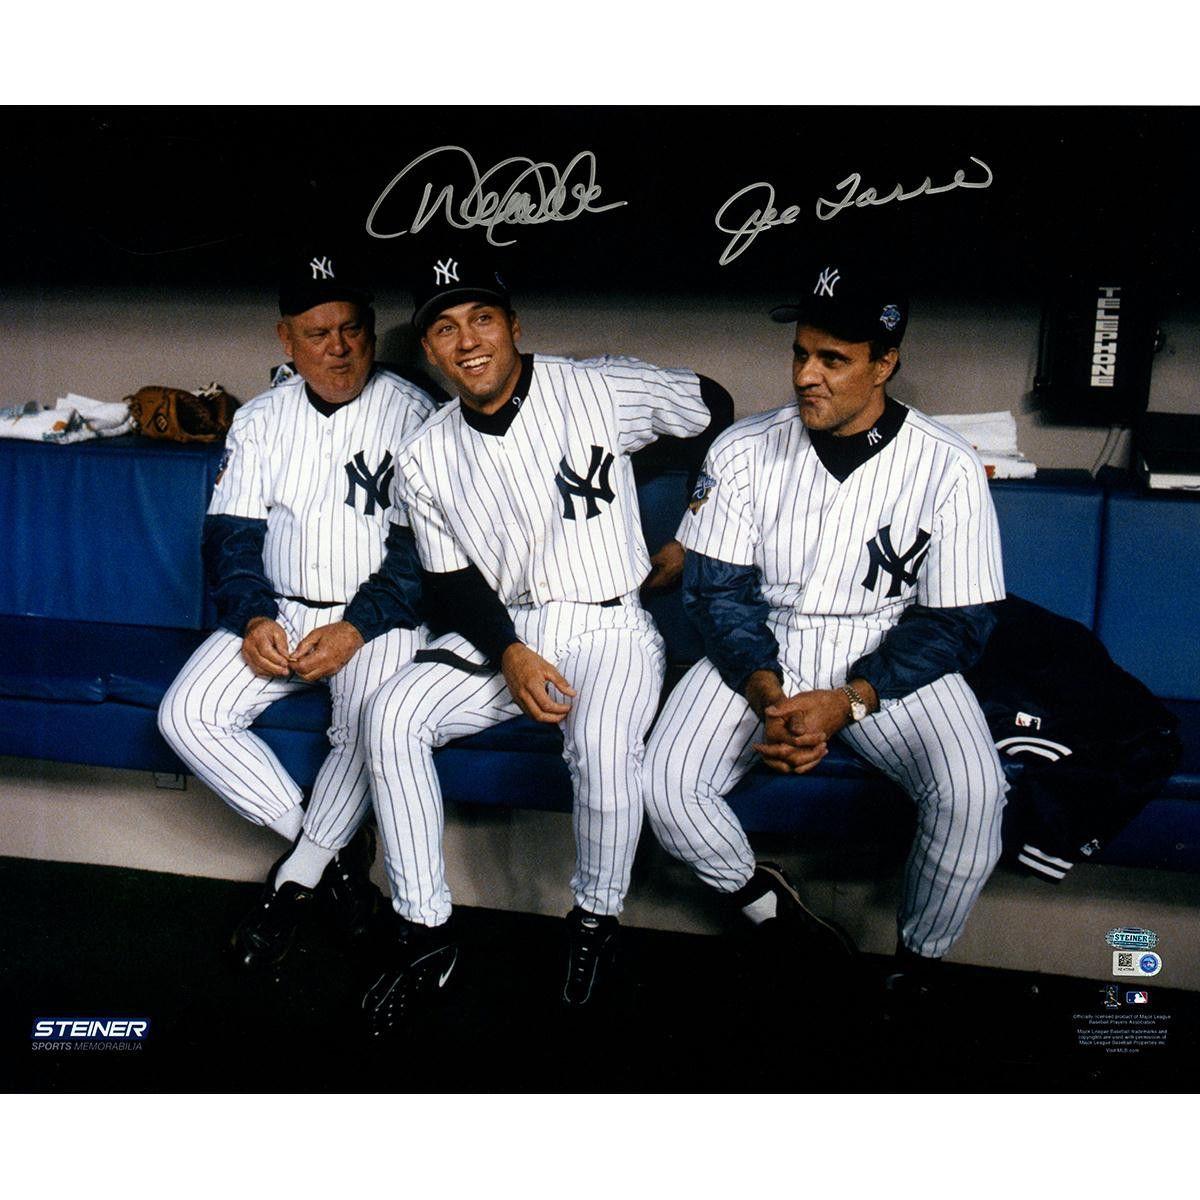 Derek Jeter Don Zimmer Joe Torre Sitting In Dugout 16x20 Photo Signed By Torre Jeter Mlb Auth Joe Torre Ny Yankees New York Yankees